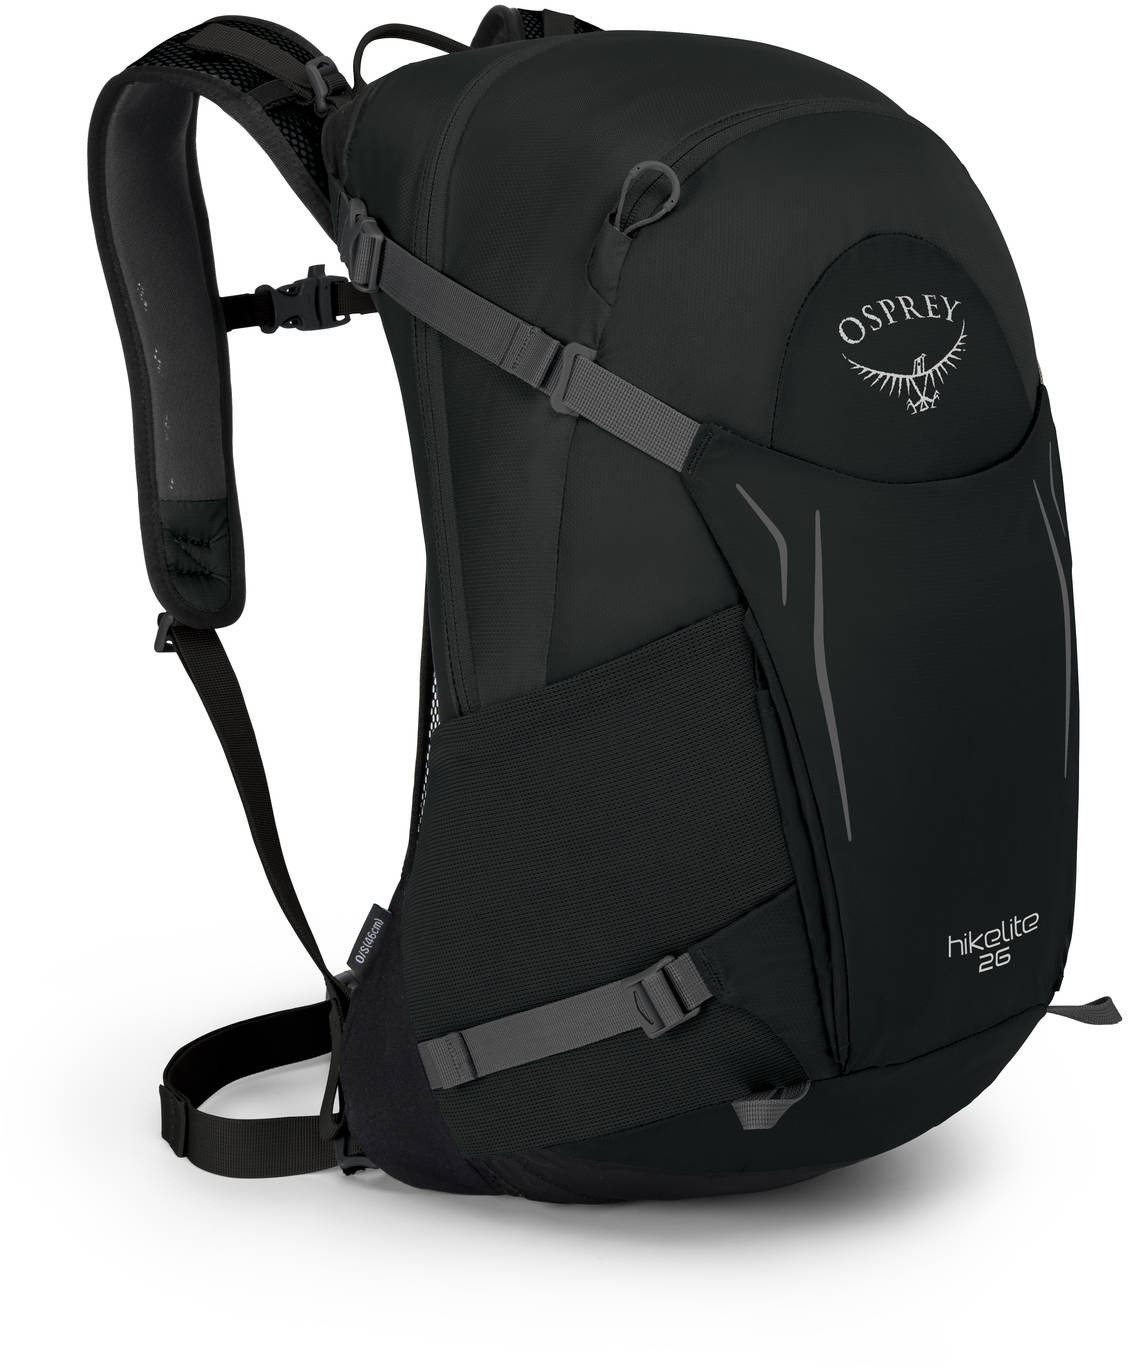 Туристические рюкзаки Рюкзак туристический Osprey Hikelite 26 Black HIkelite26_S18_Side_Black_web.jpg